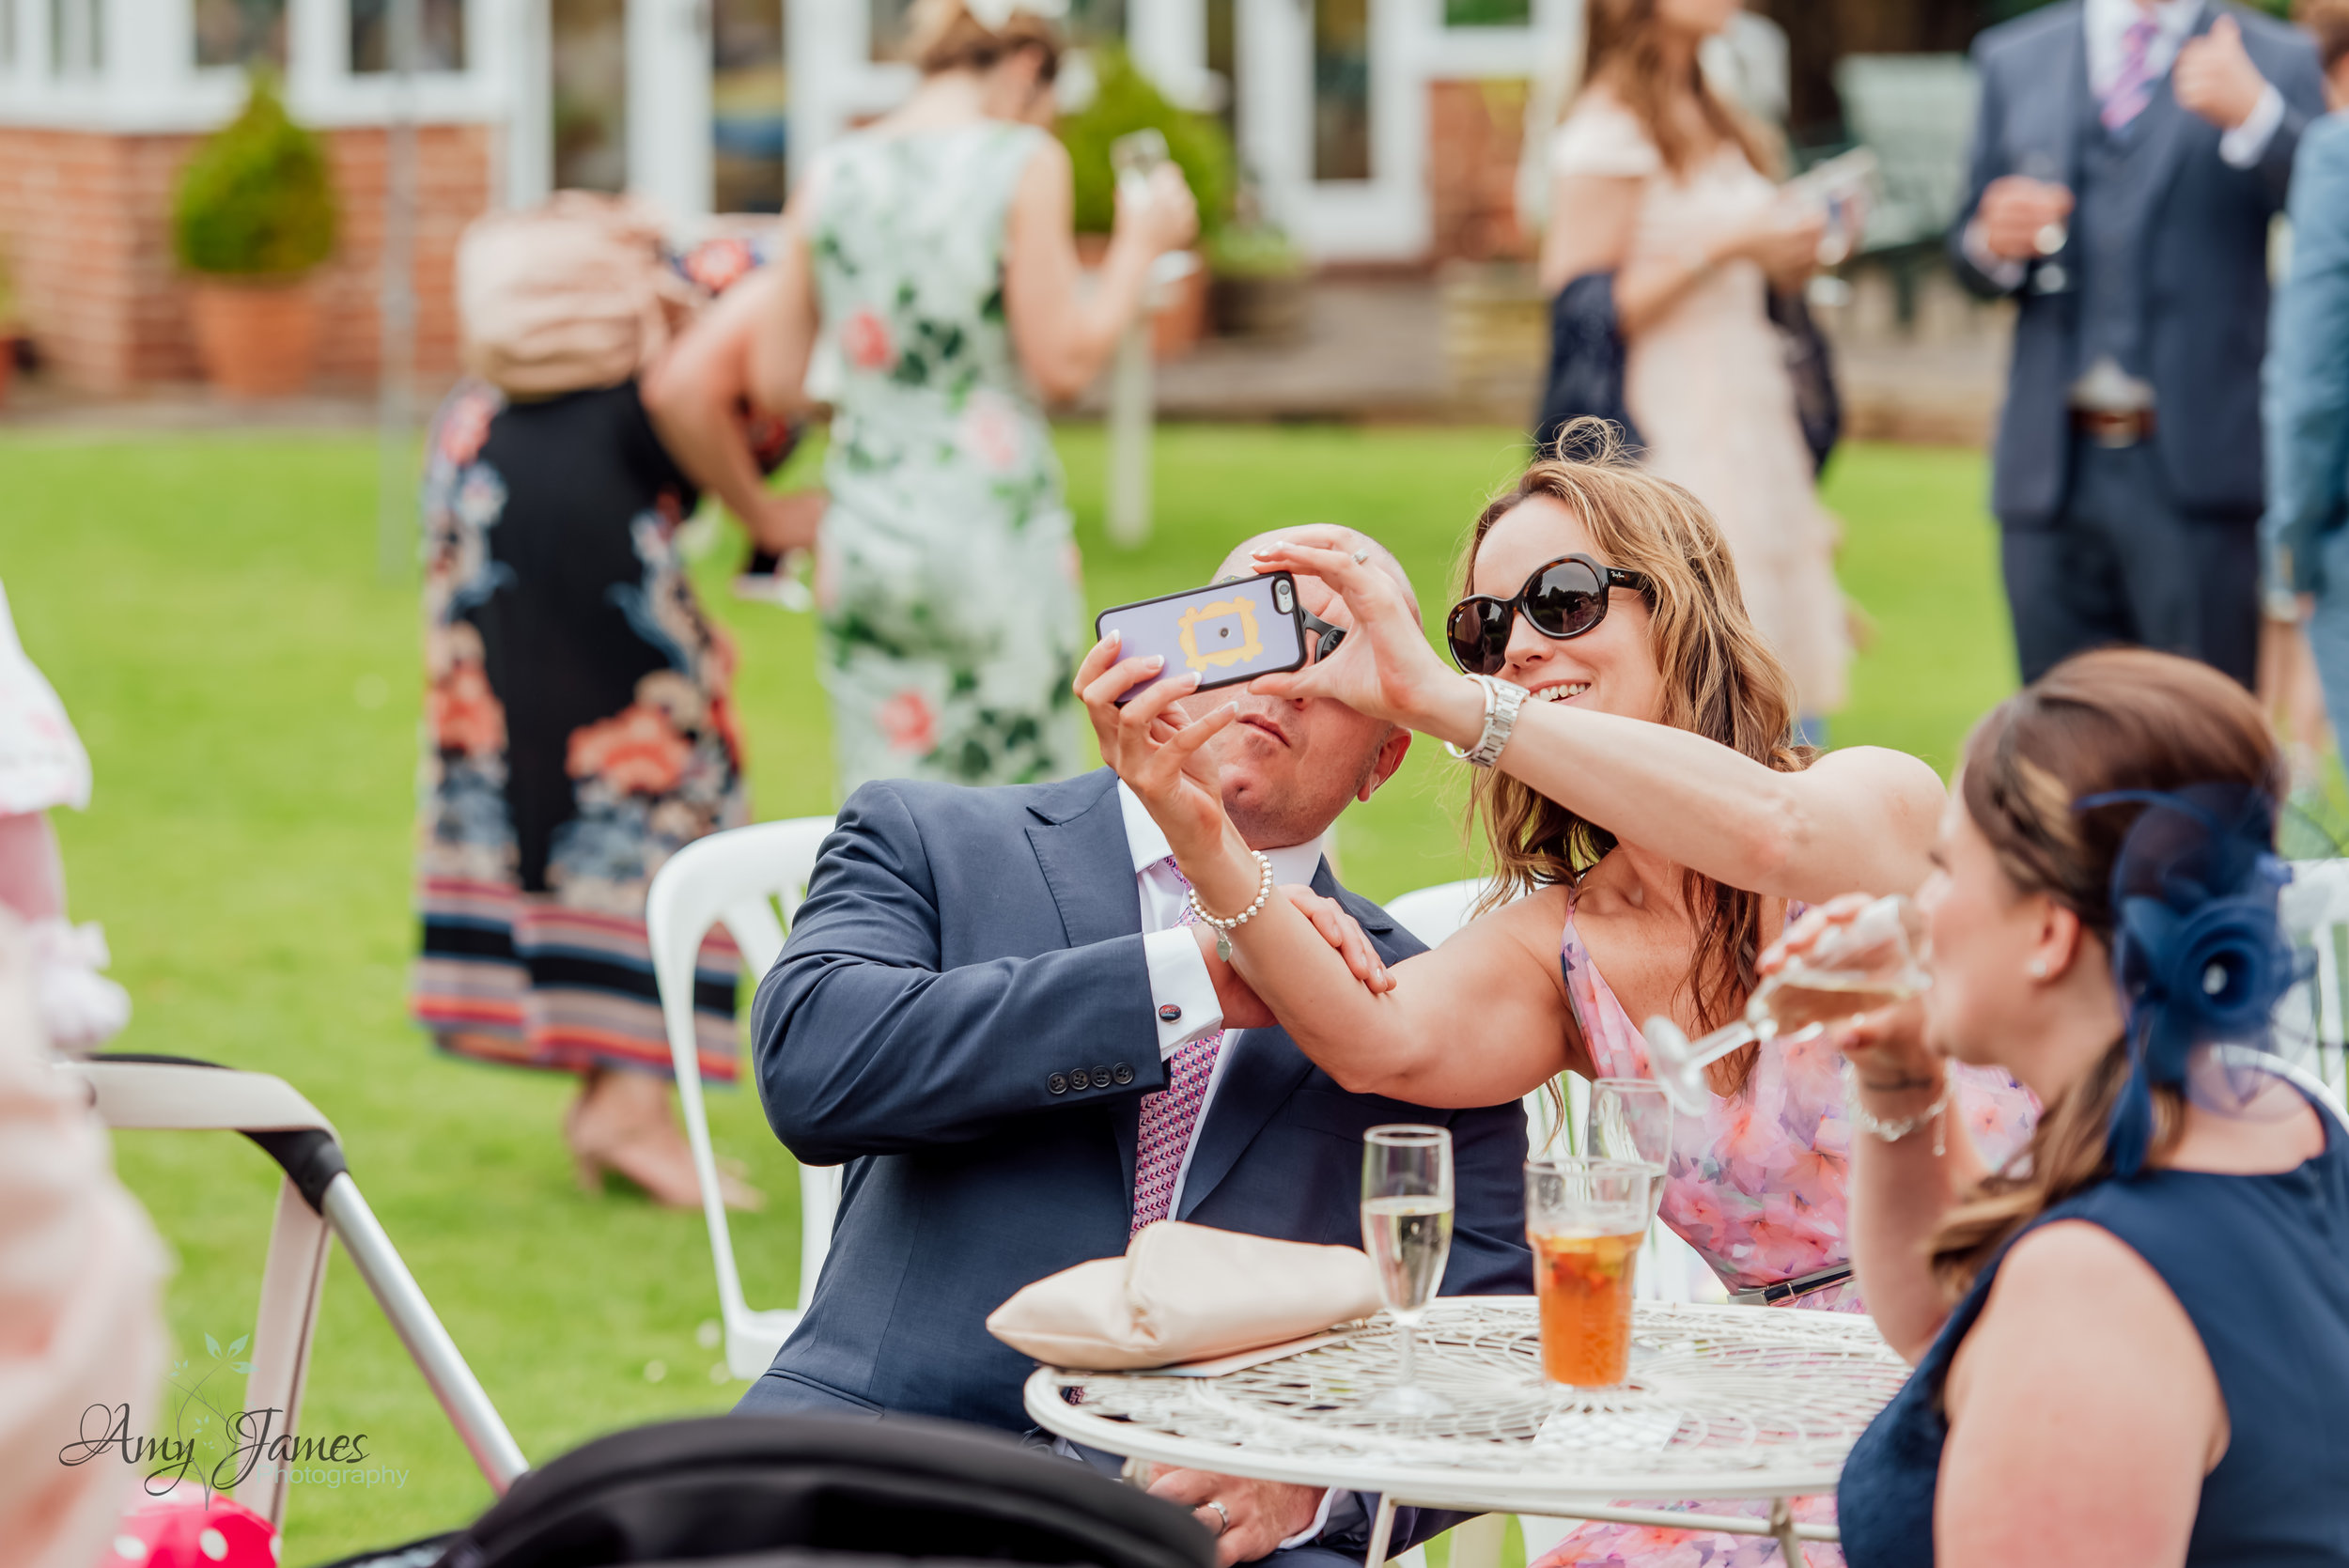 Outdoor garden wedding ceremony photograph by Amy James Photography Hampshire Wedding Photographer - Taplins Place Wedding selfie